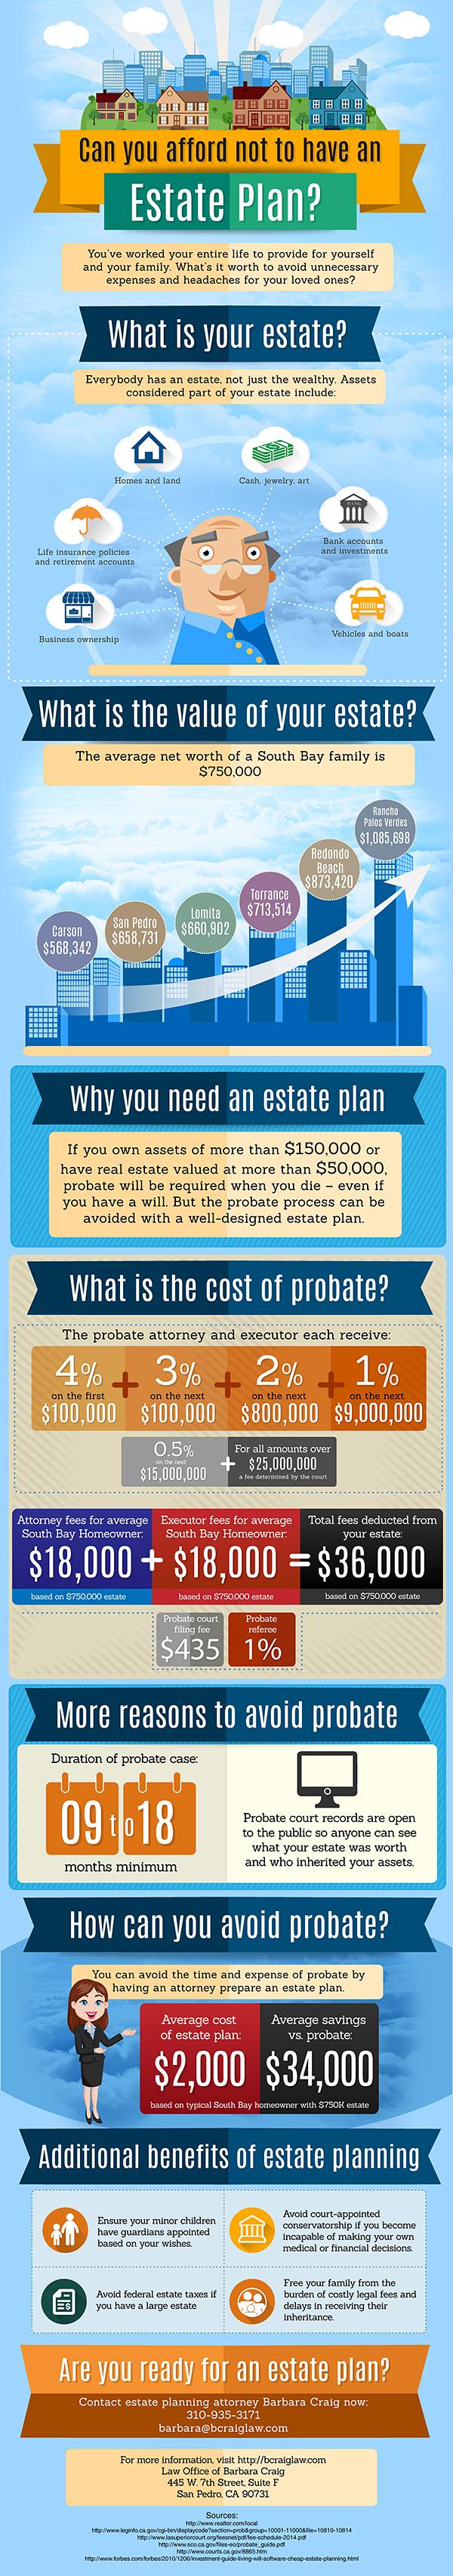 estate planning south bay attorney